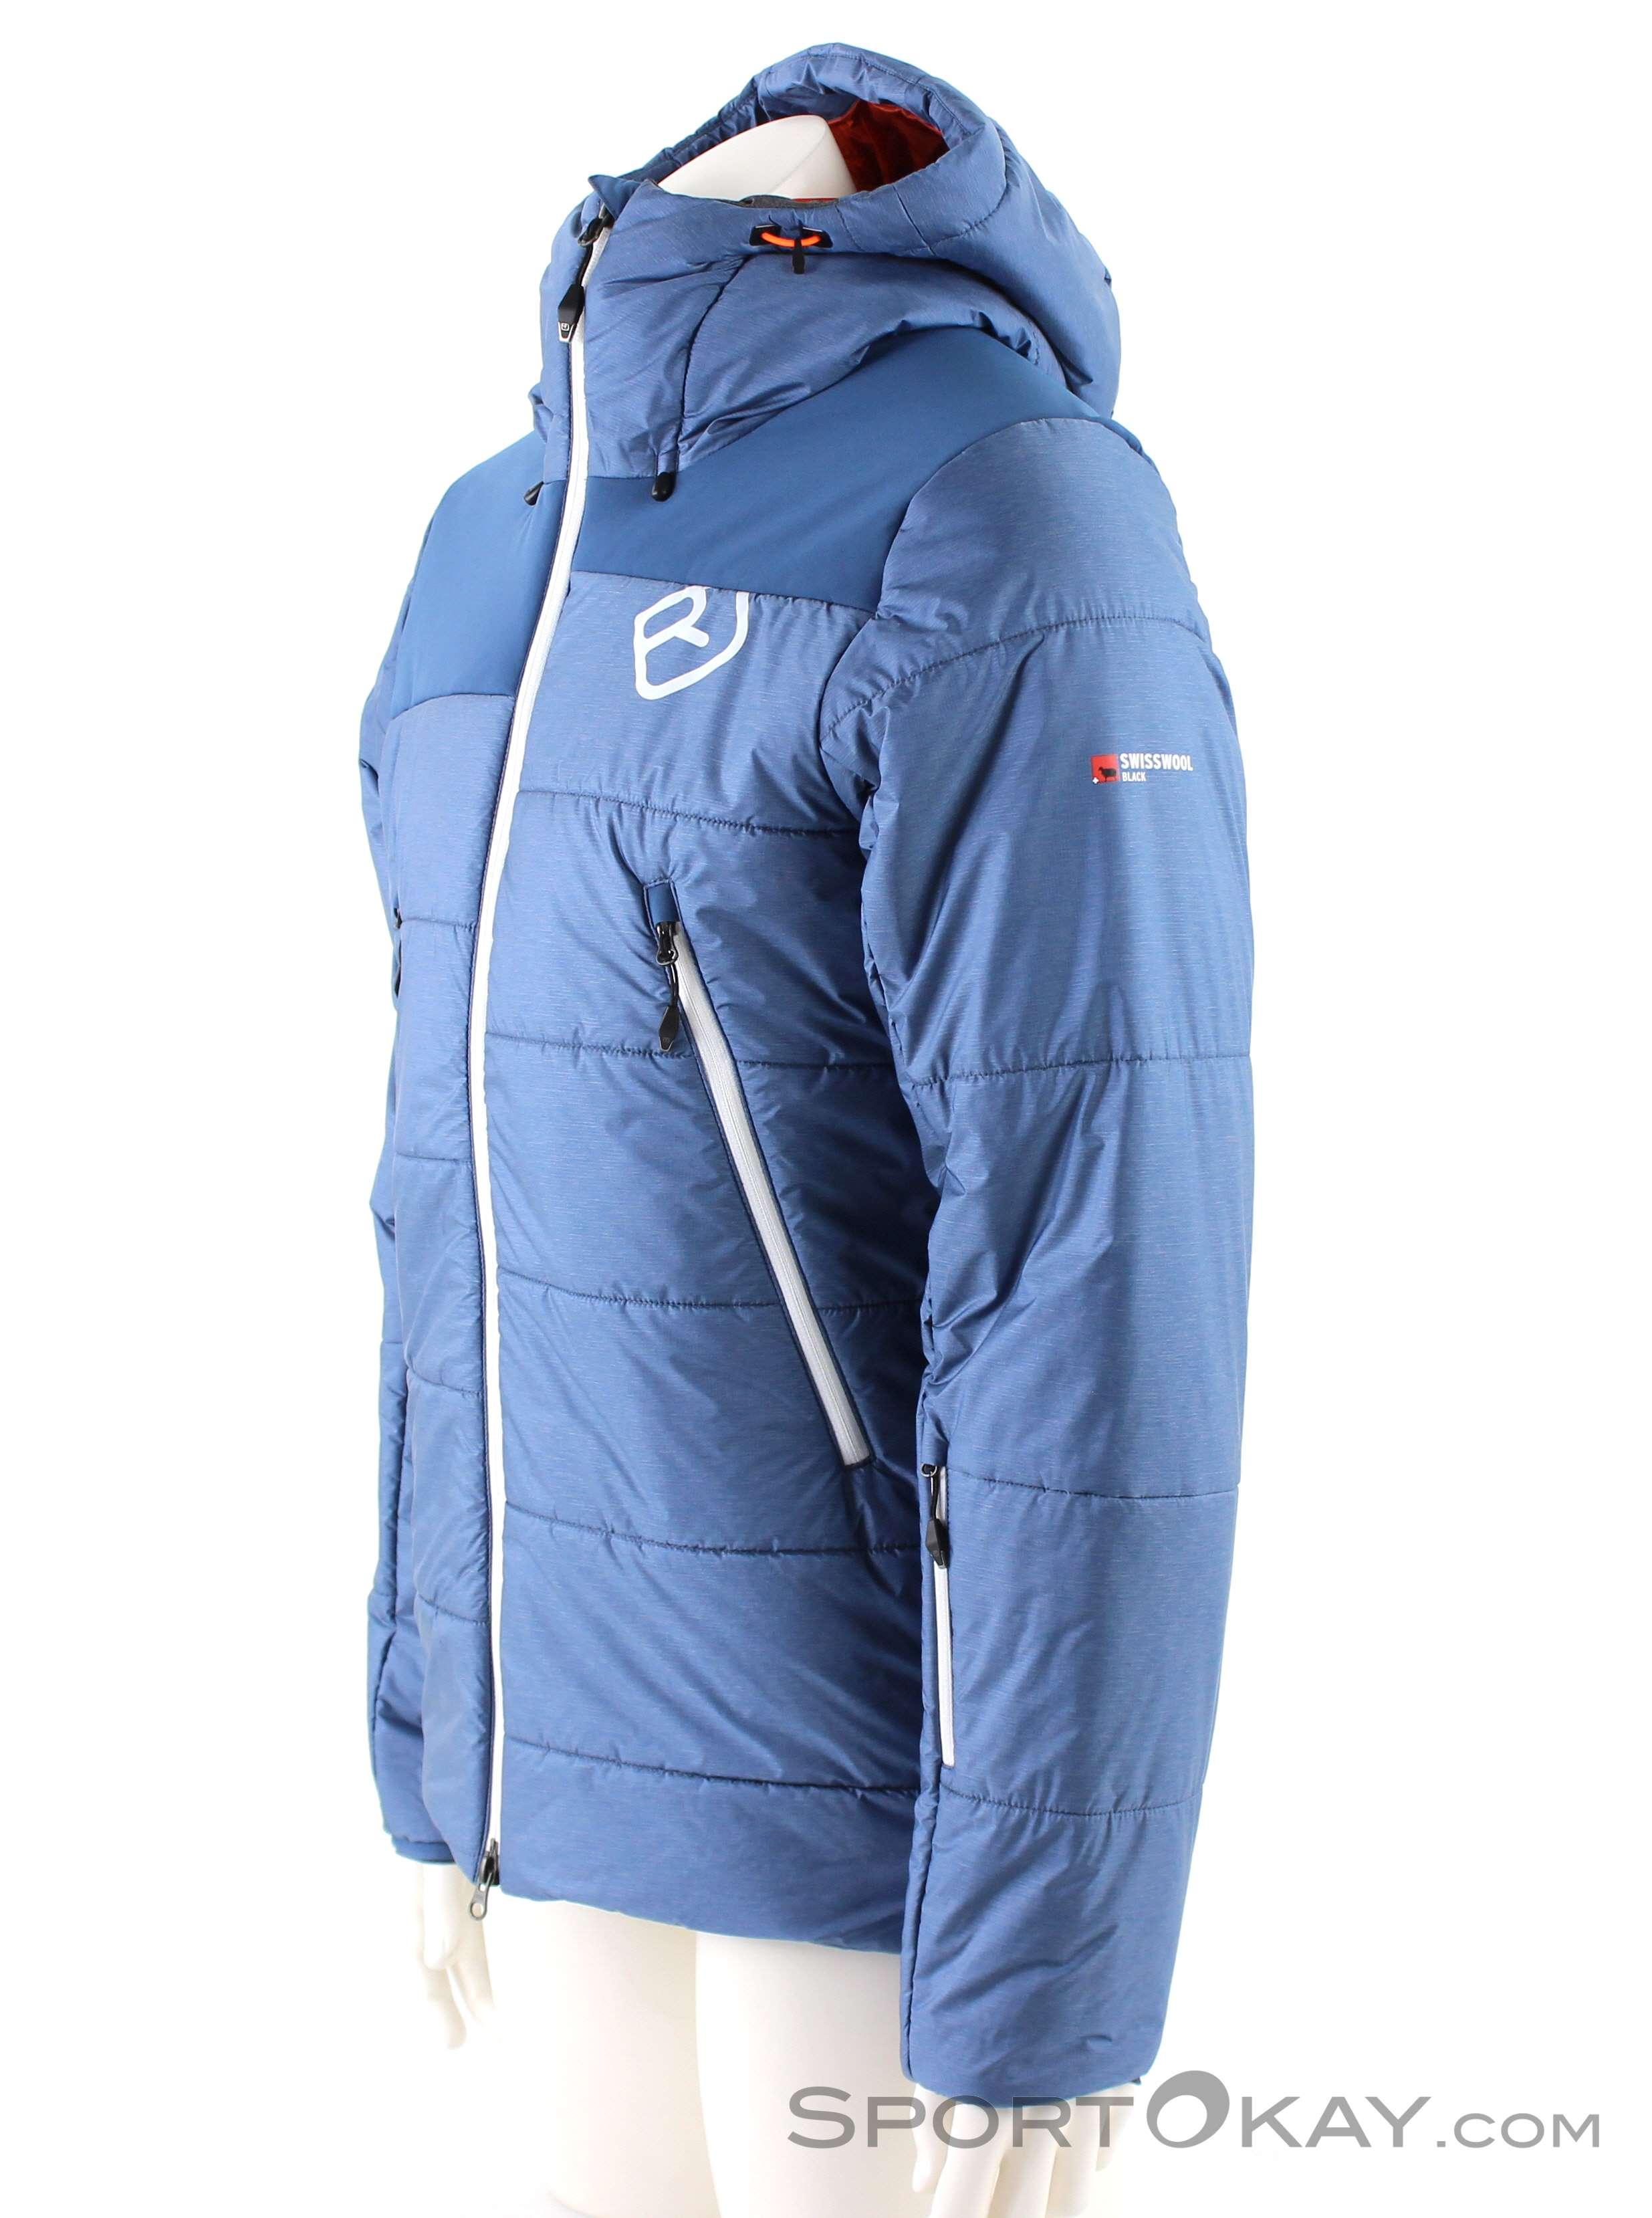 Ortovox Ortovox Swisswool Verbier Jacket Mens Ski Jacket